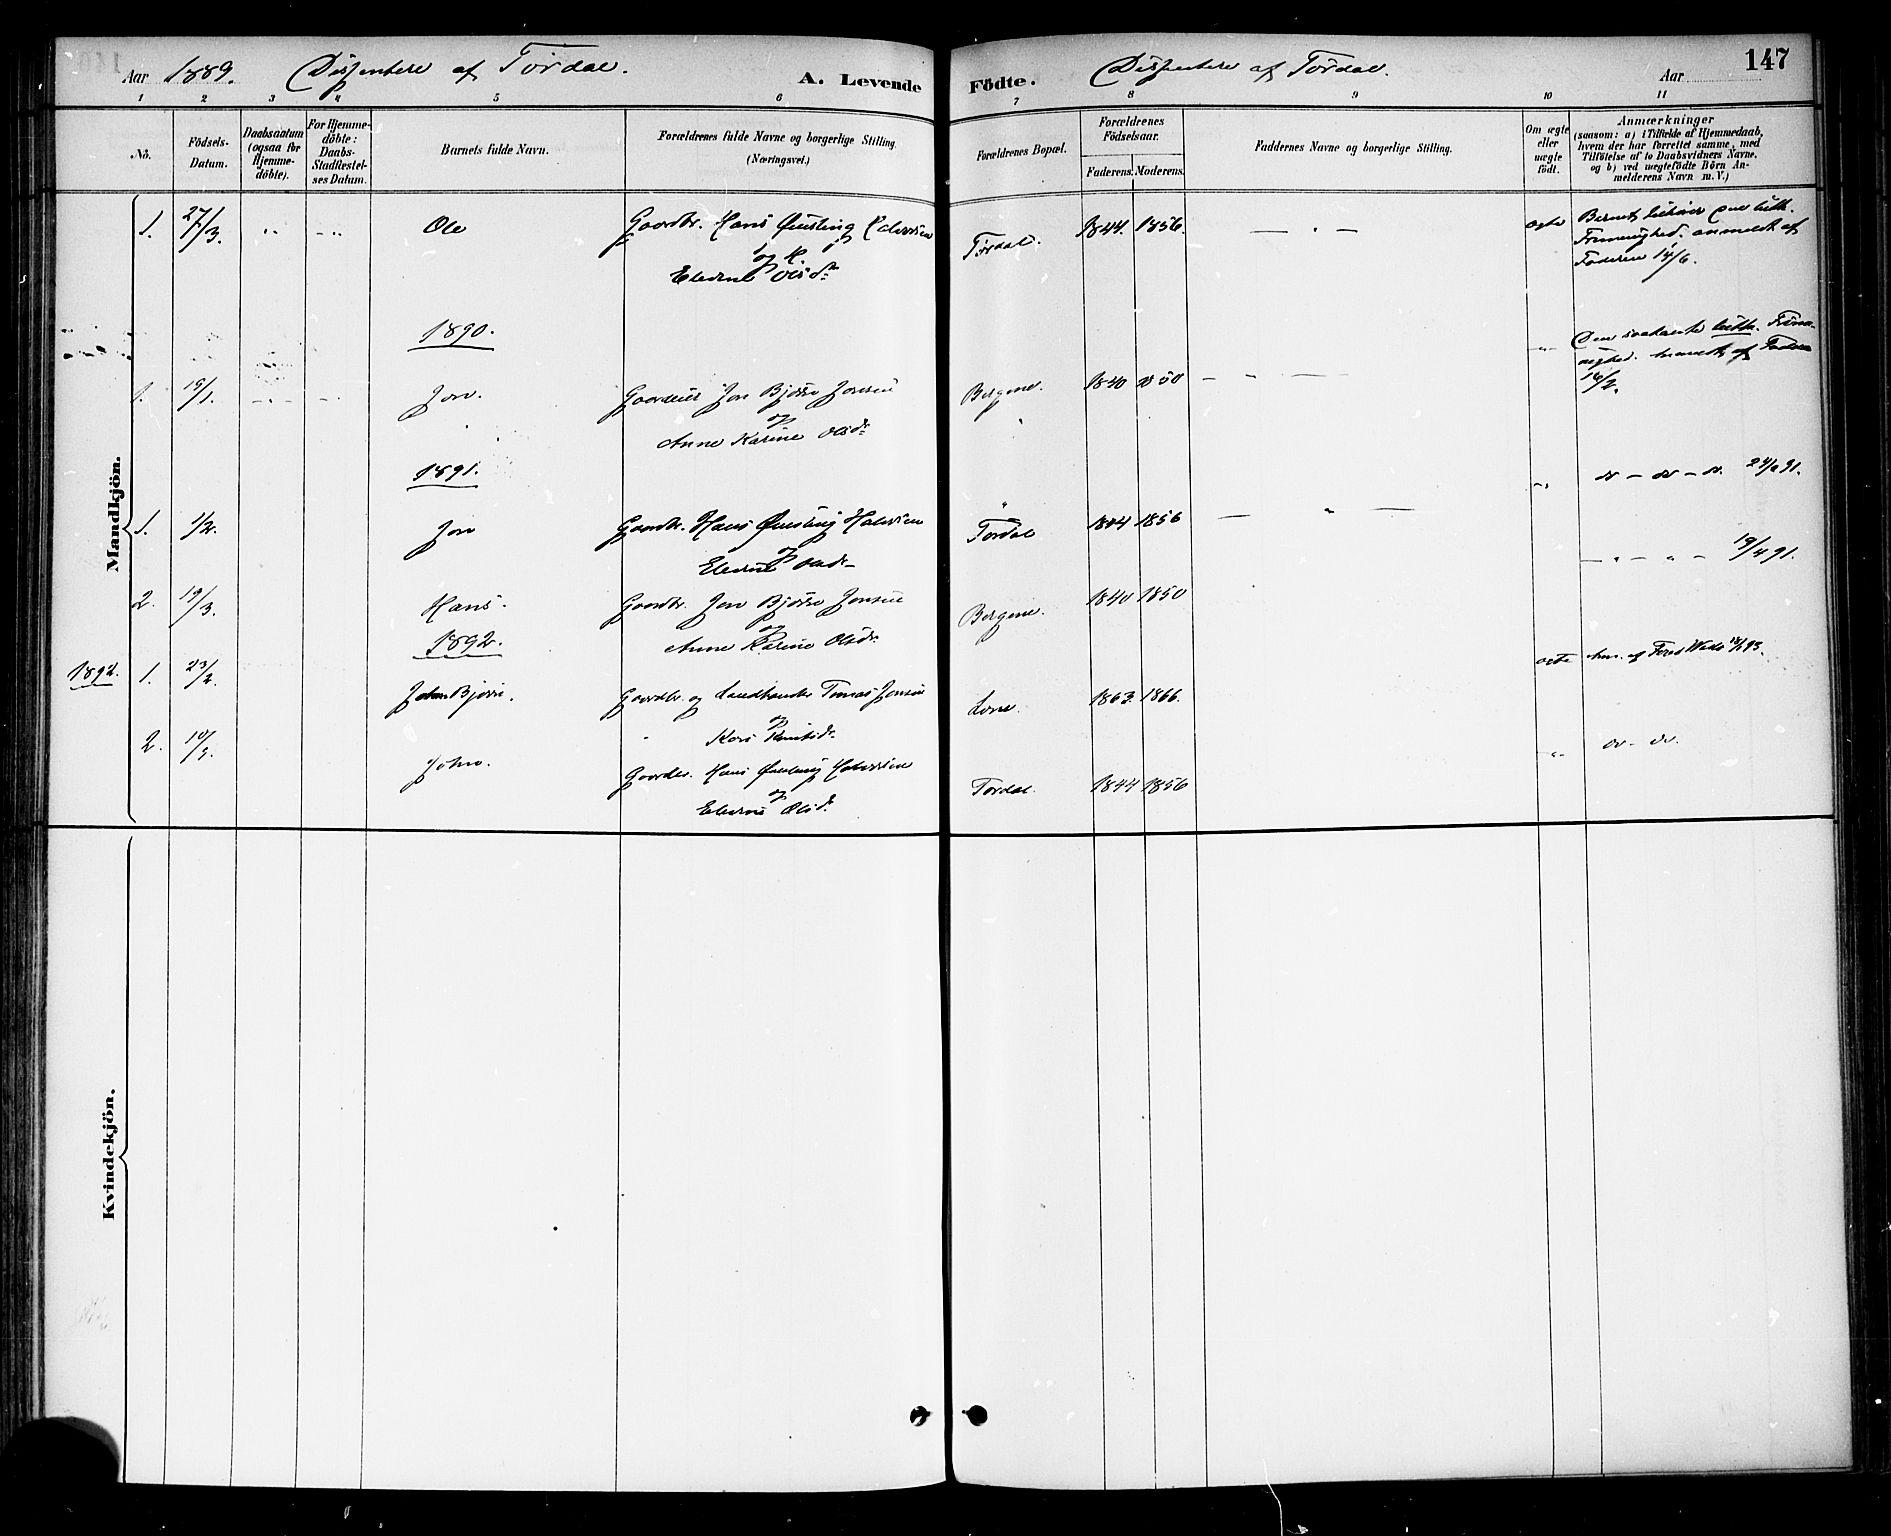 SAKO, Drangedal kirkebøker, F/Fa/L0010: Ministerialbok nr. 10 /2, 1885-1894, s. 147